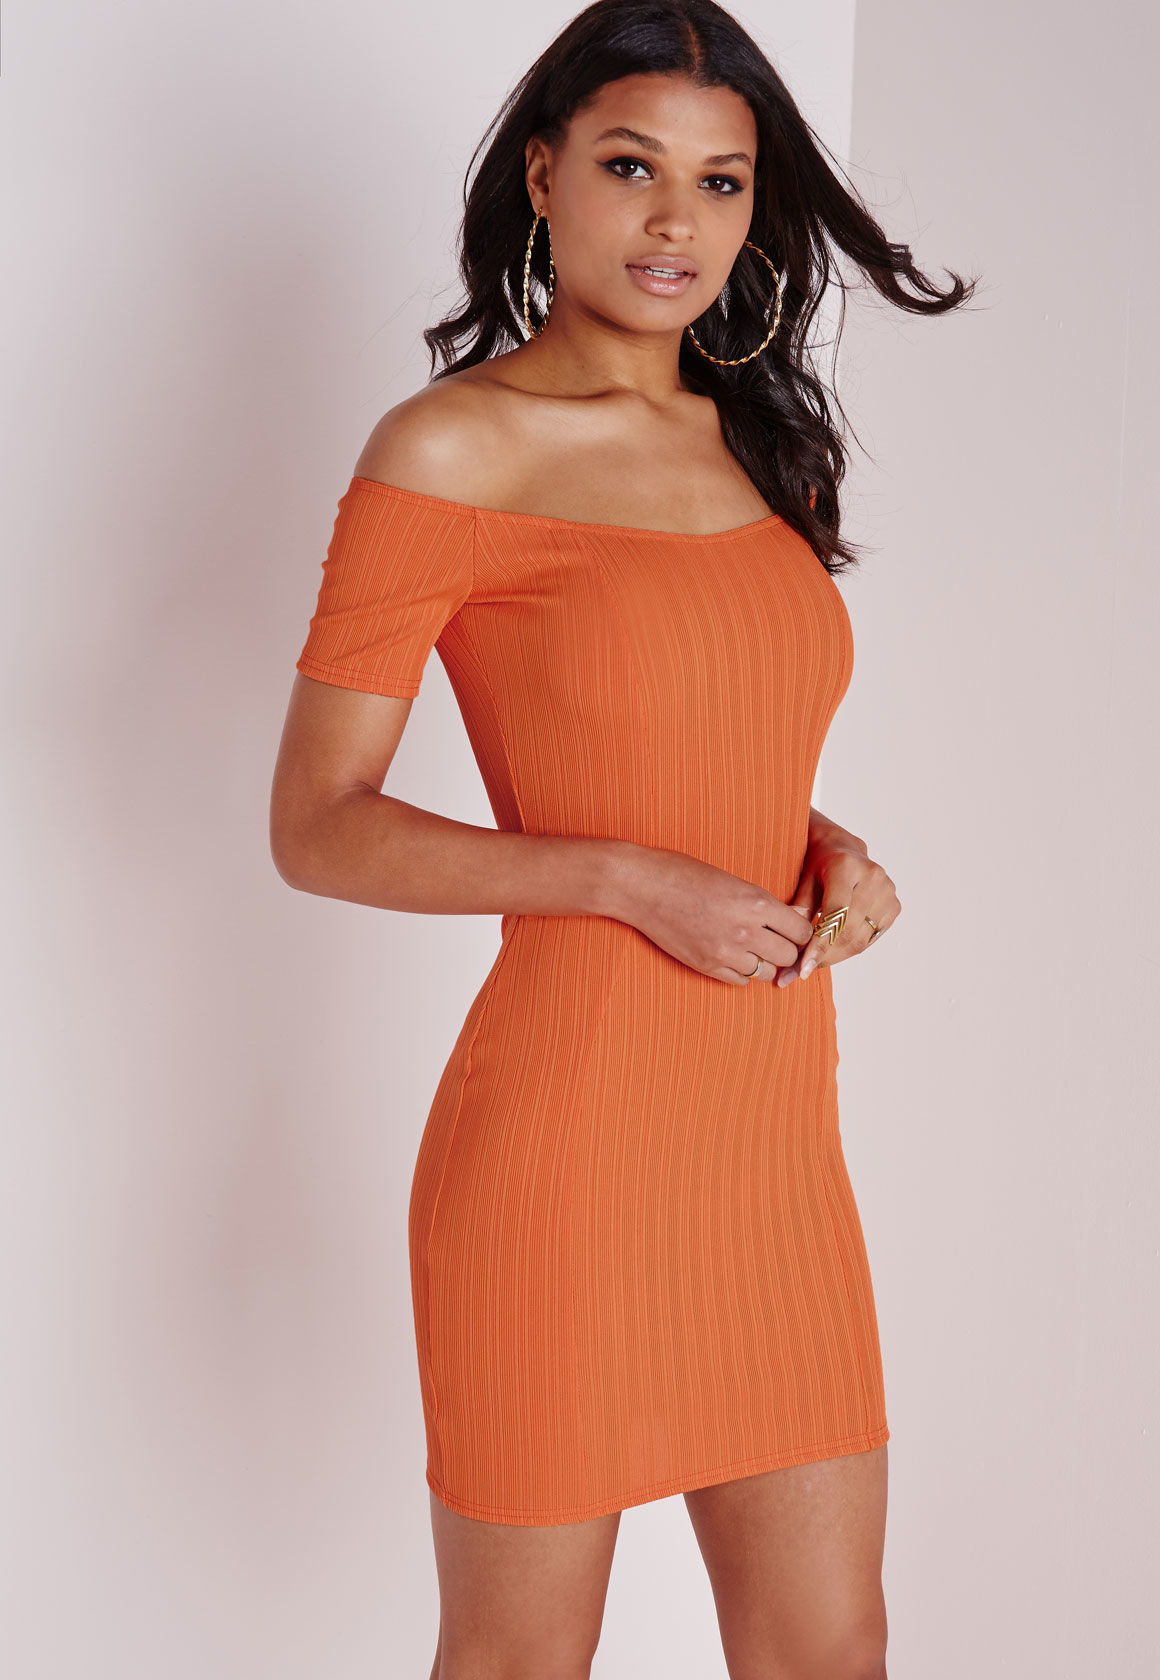 Sale golf ribbed neck orange bodycon dress bright scoop zaire games